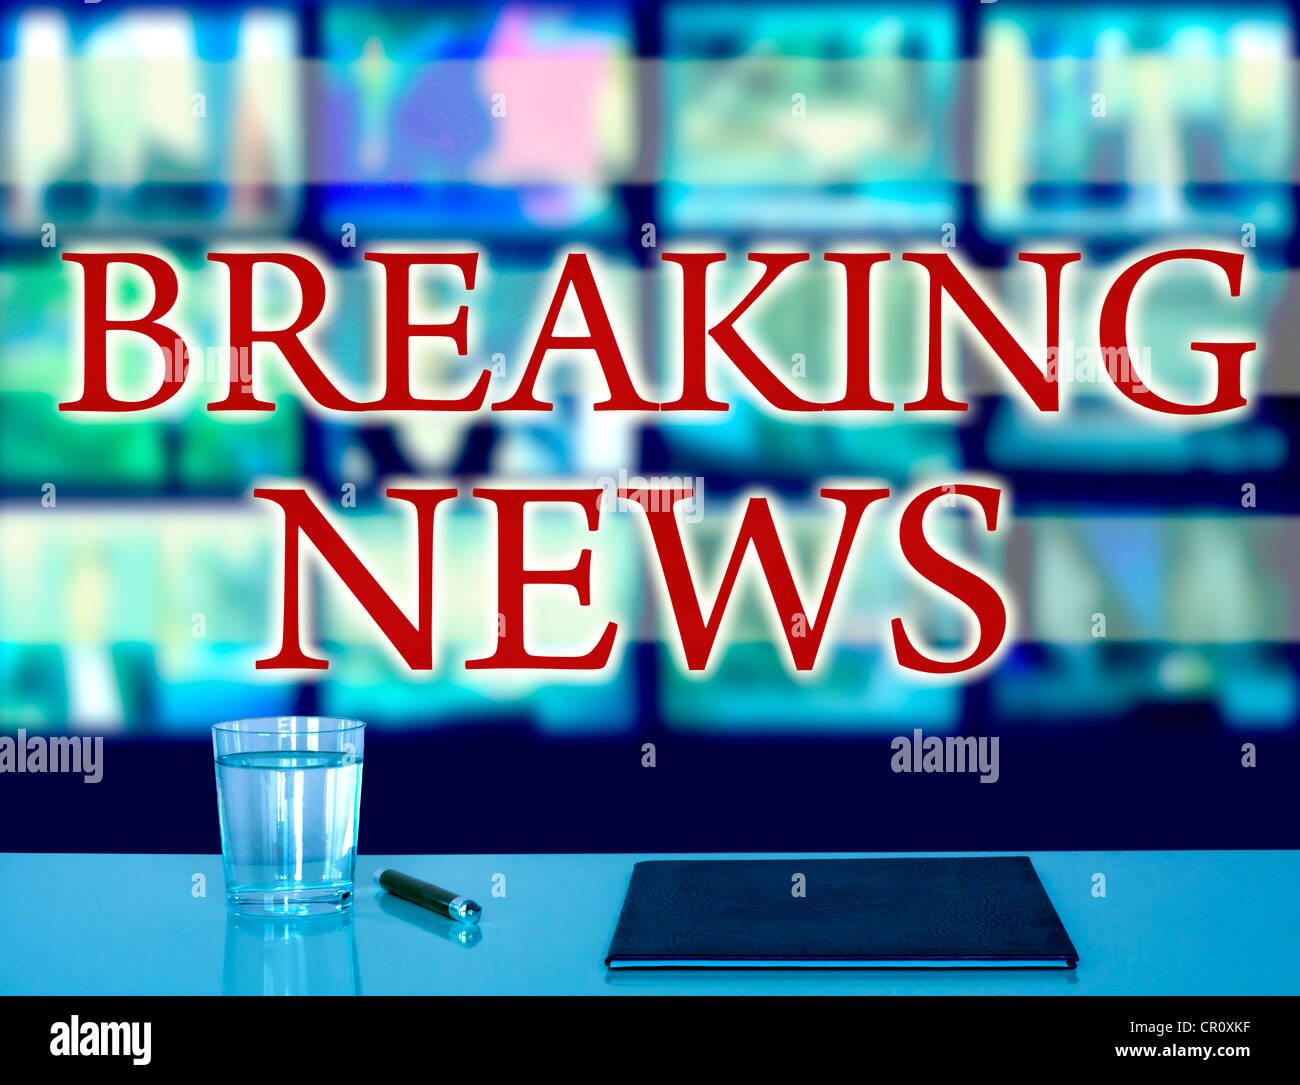 Breaking news television studio media concept background - Stock Image